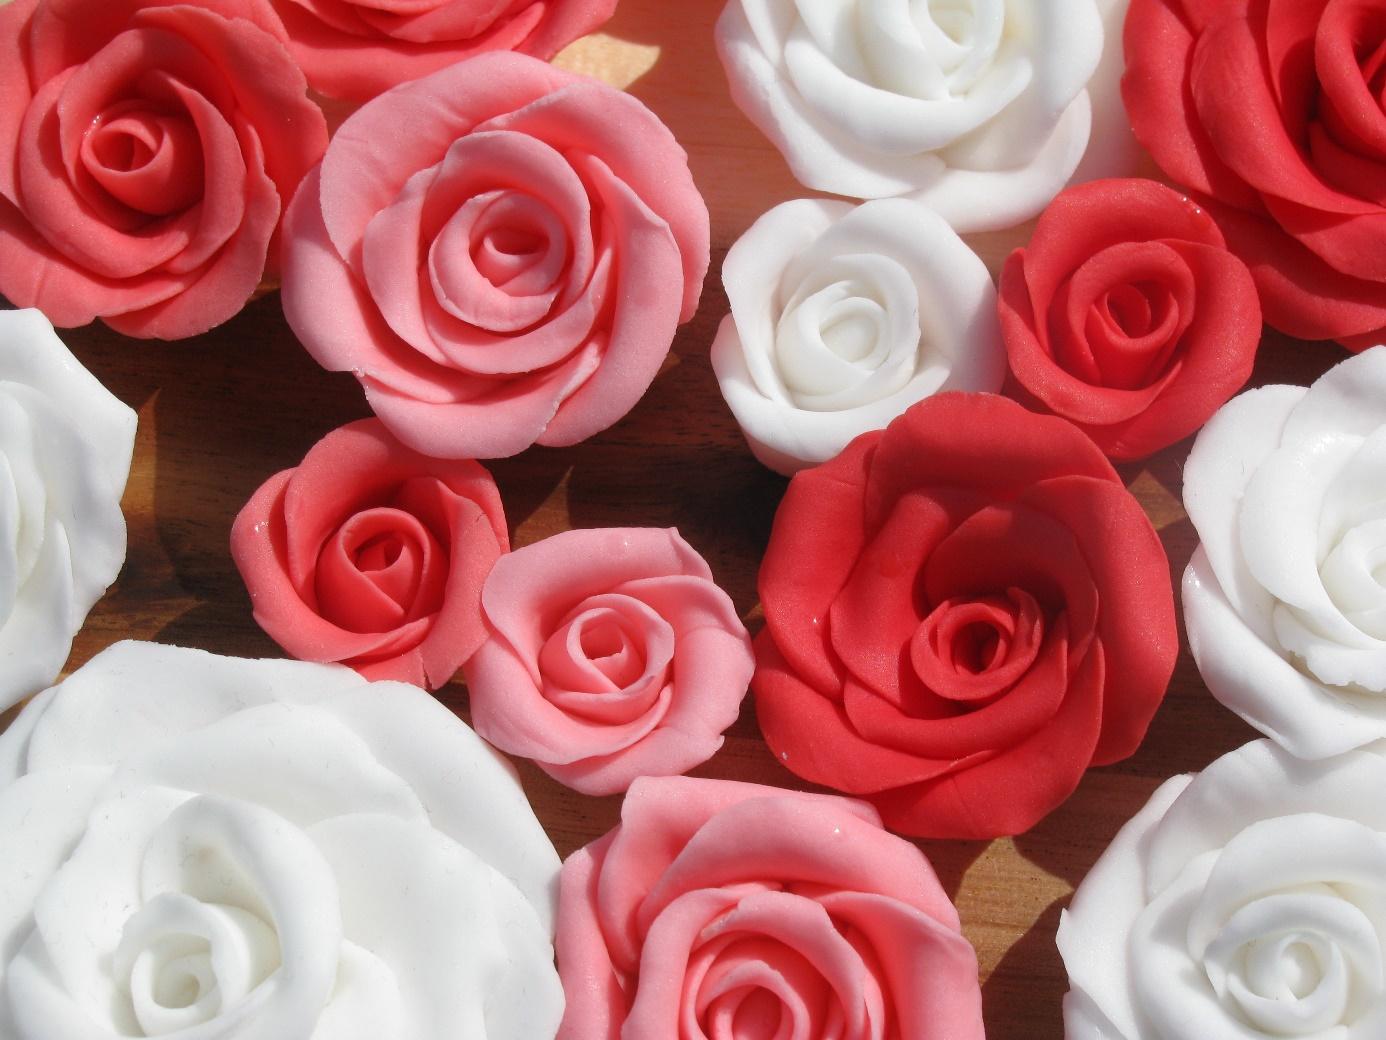 fondant bloemen maken